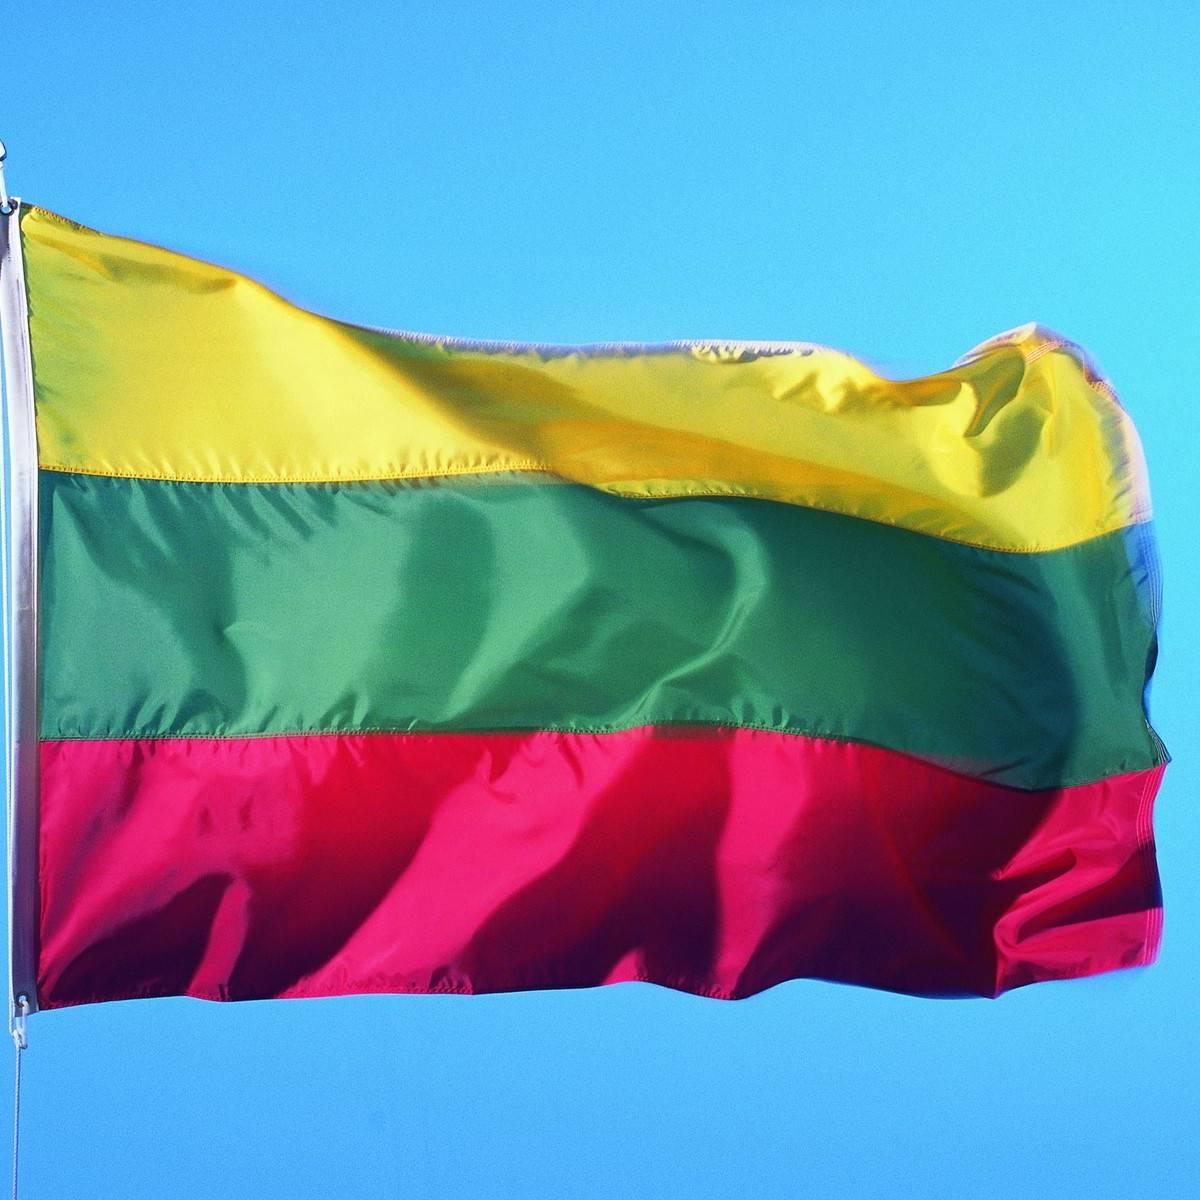 Литва: ложь как основа госполитики